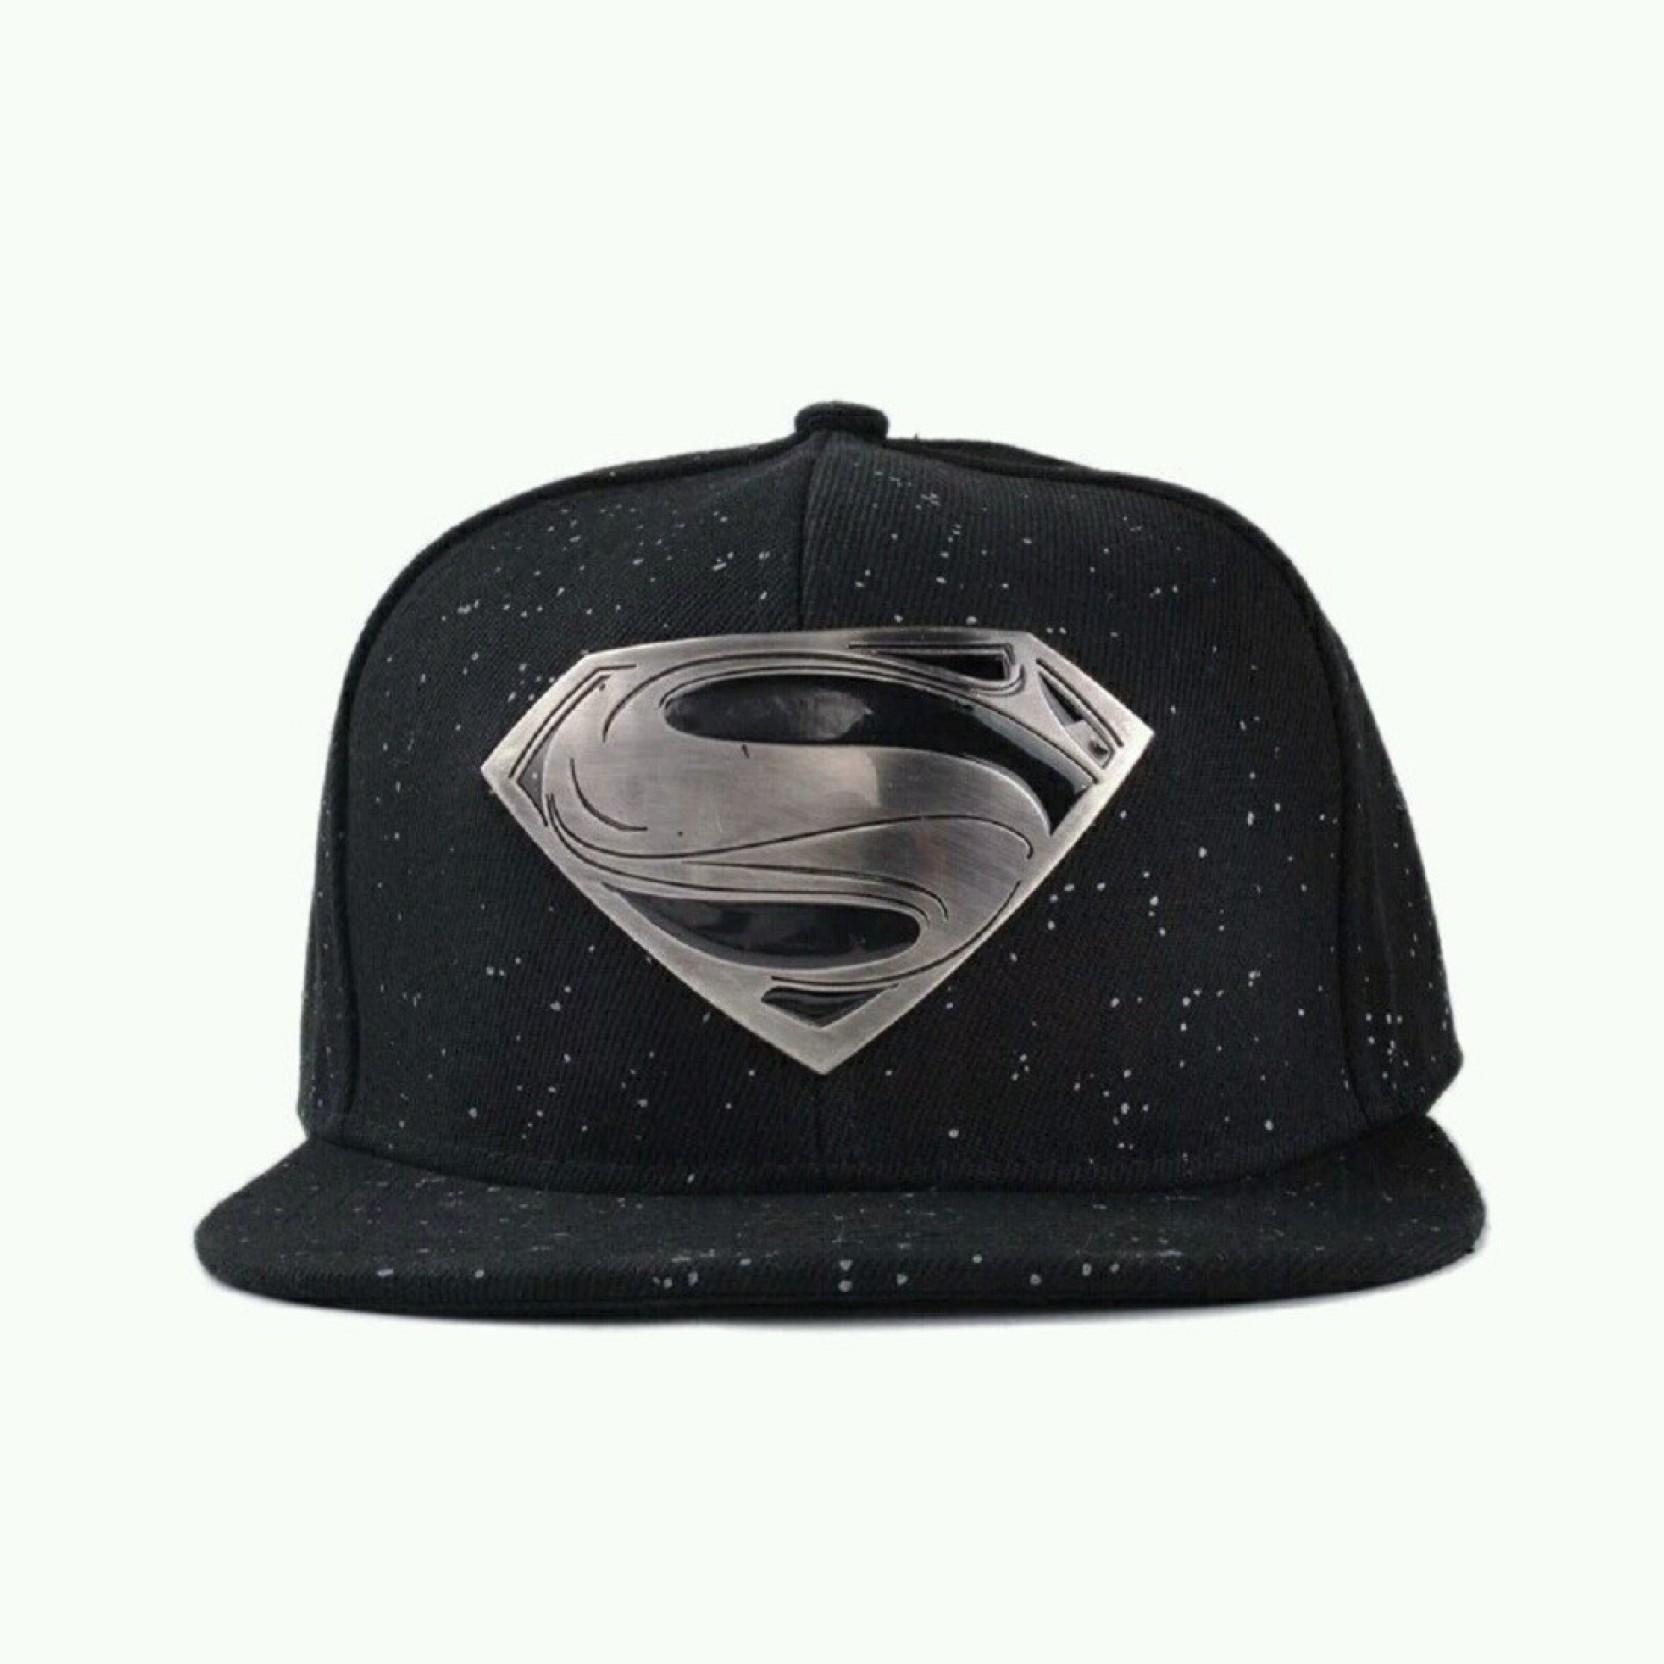 FAS Superman Snapback And Hip hop Cap - Buy FAS Superman Snapback ... 51e4150b2b1